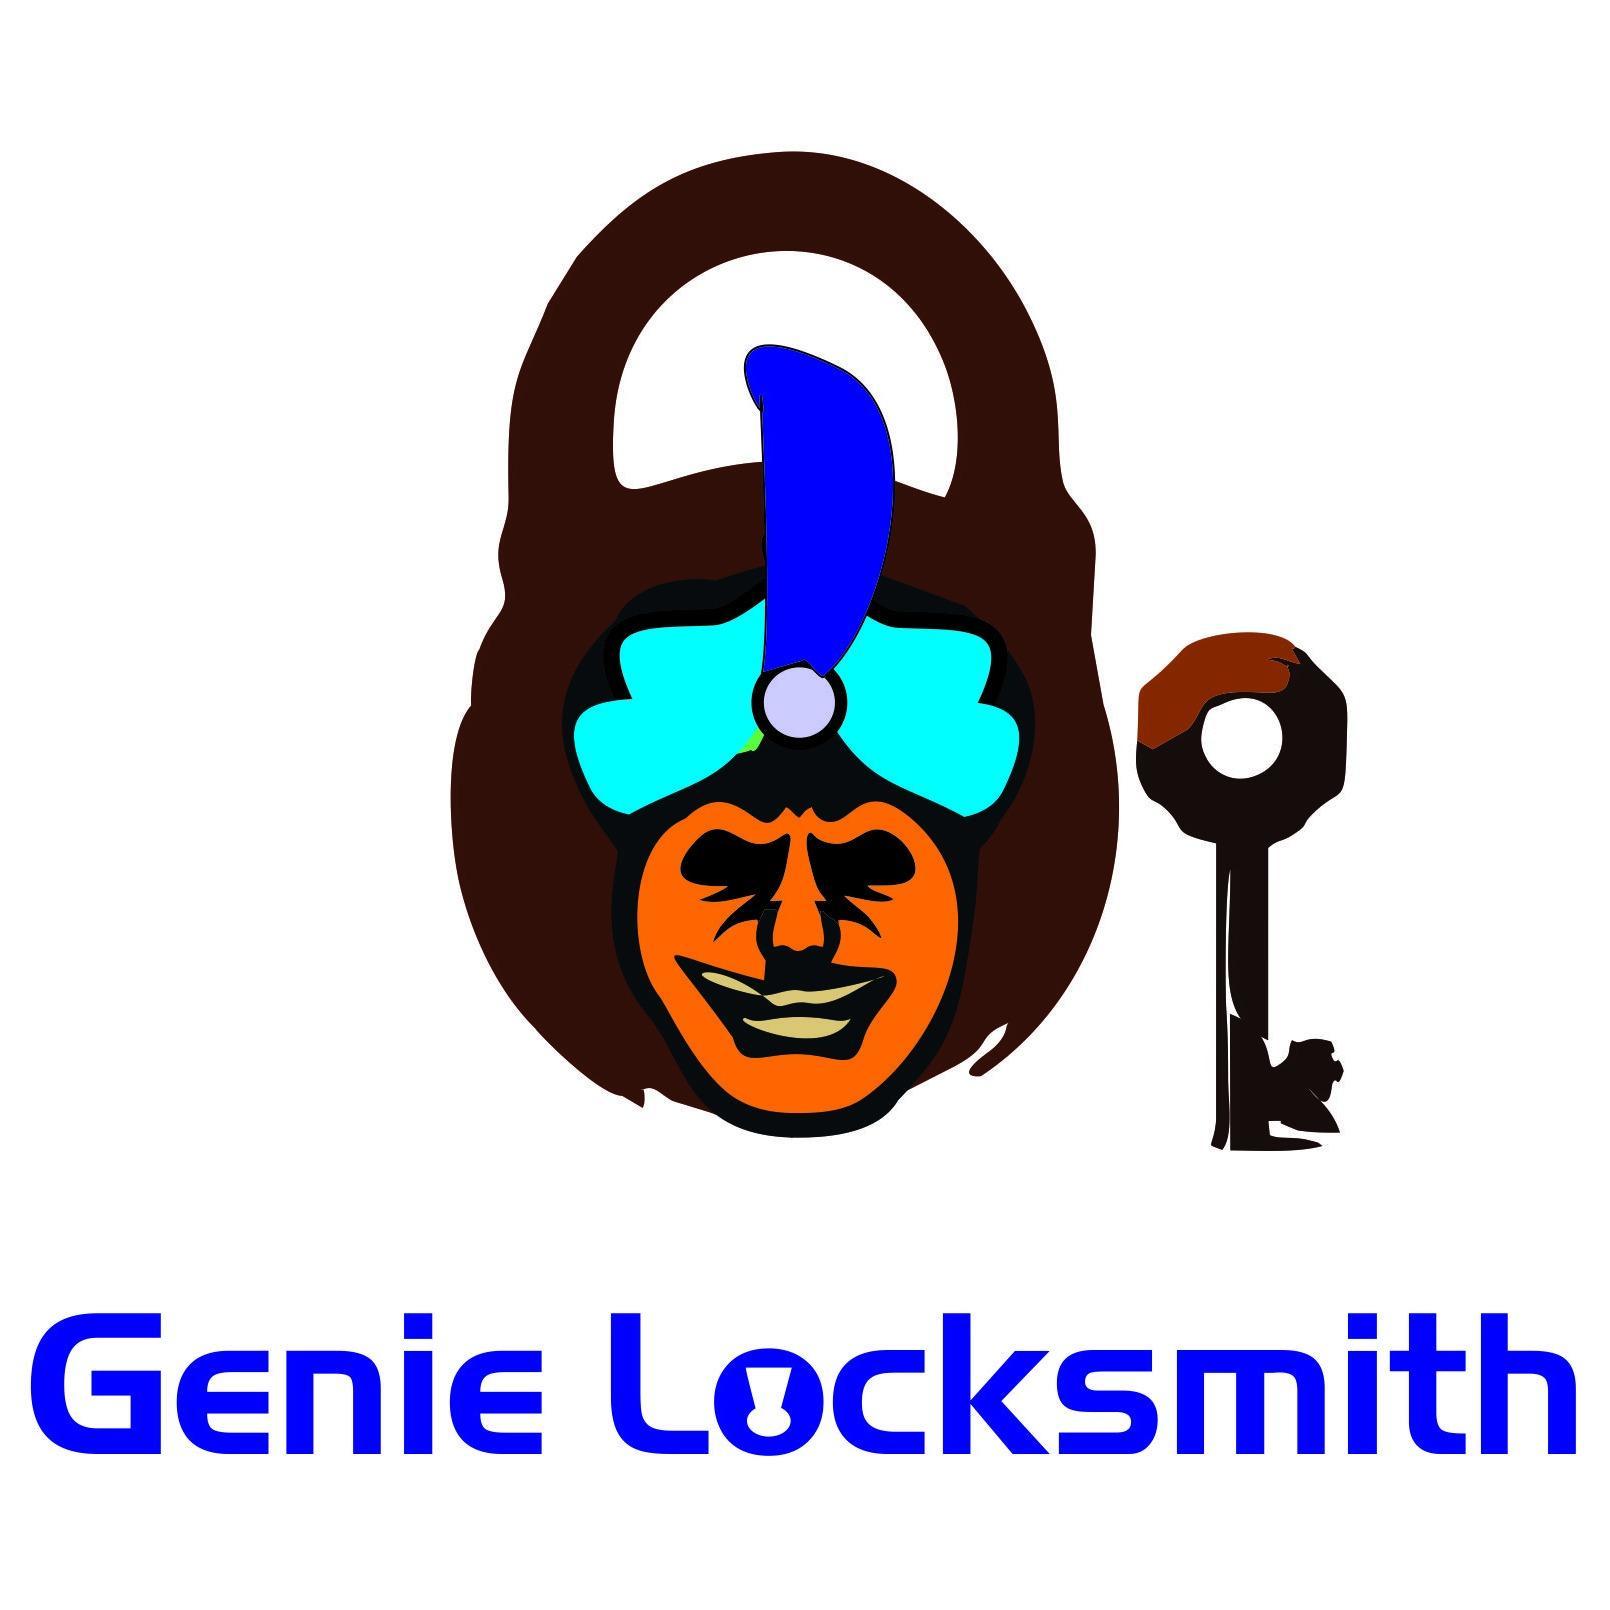 image of the Genie Locksmith